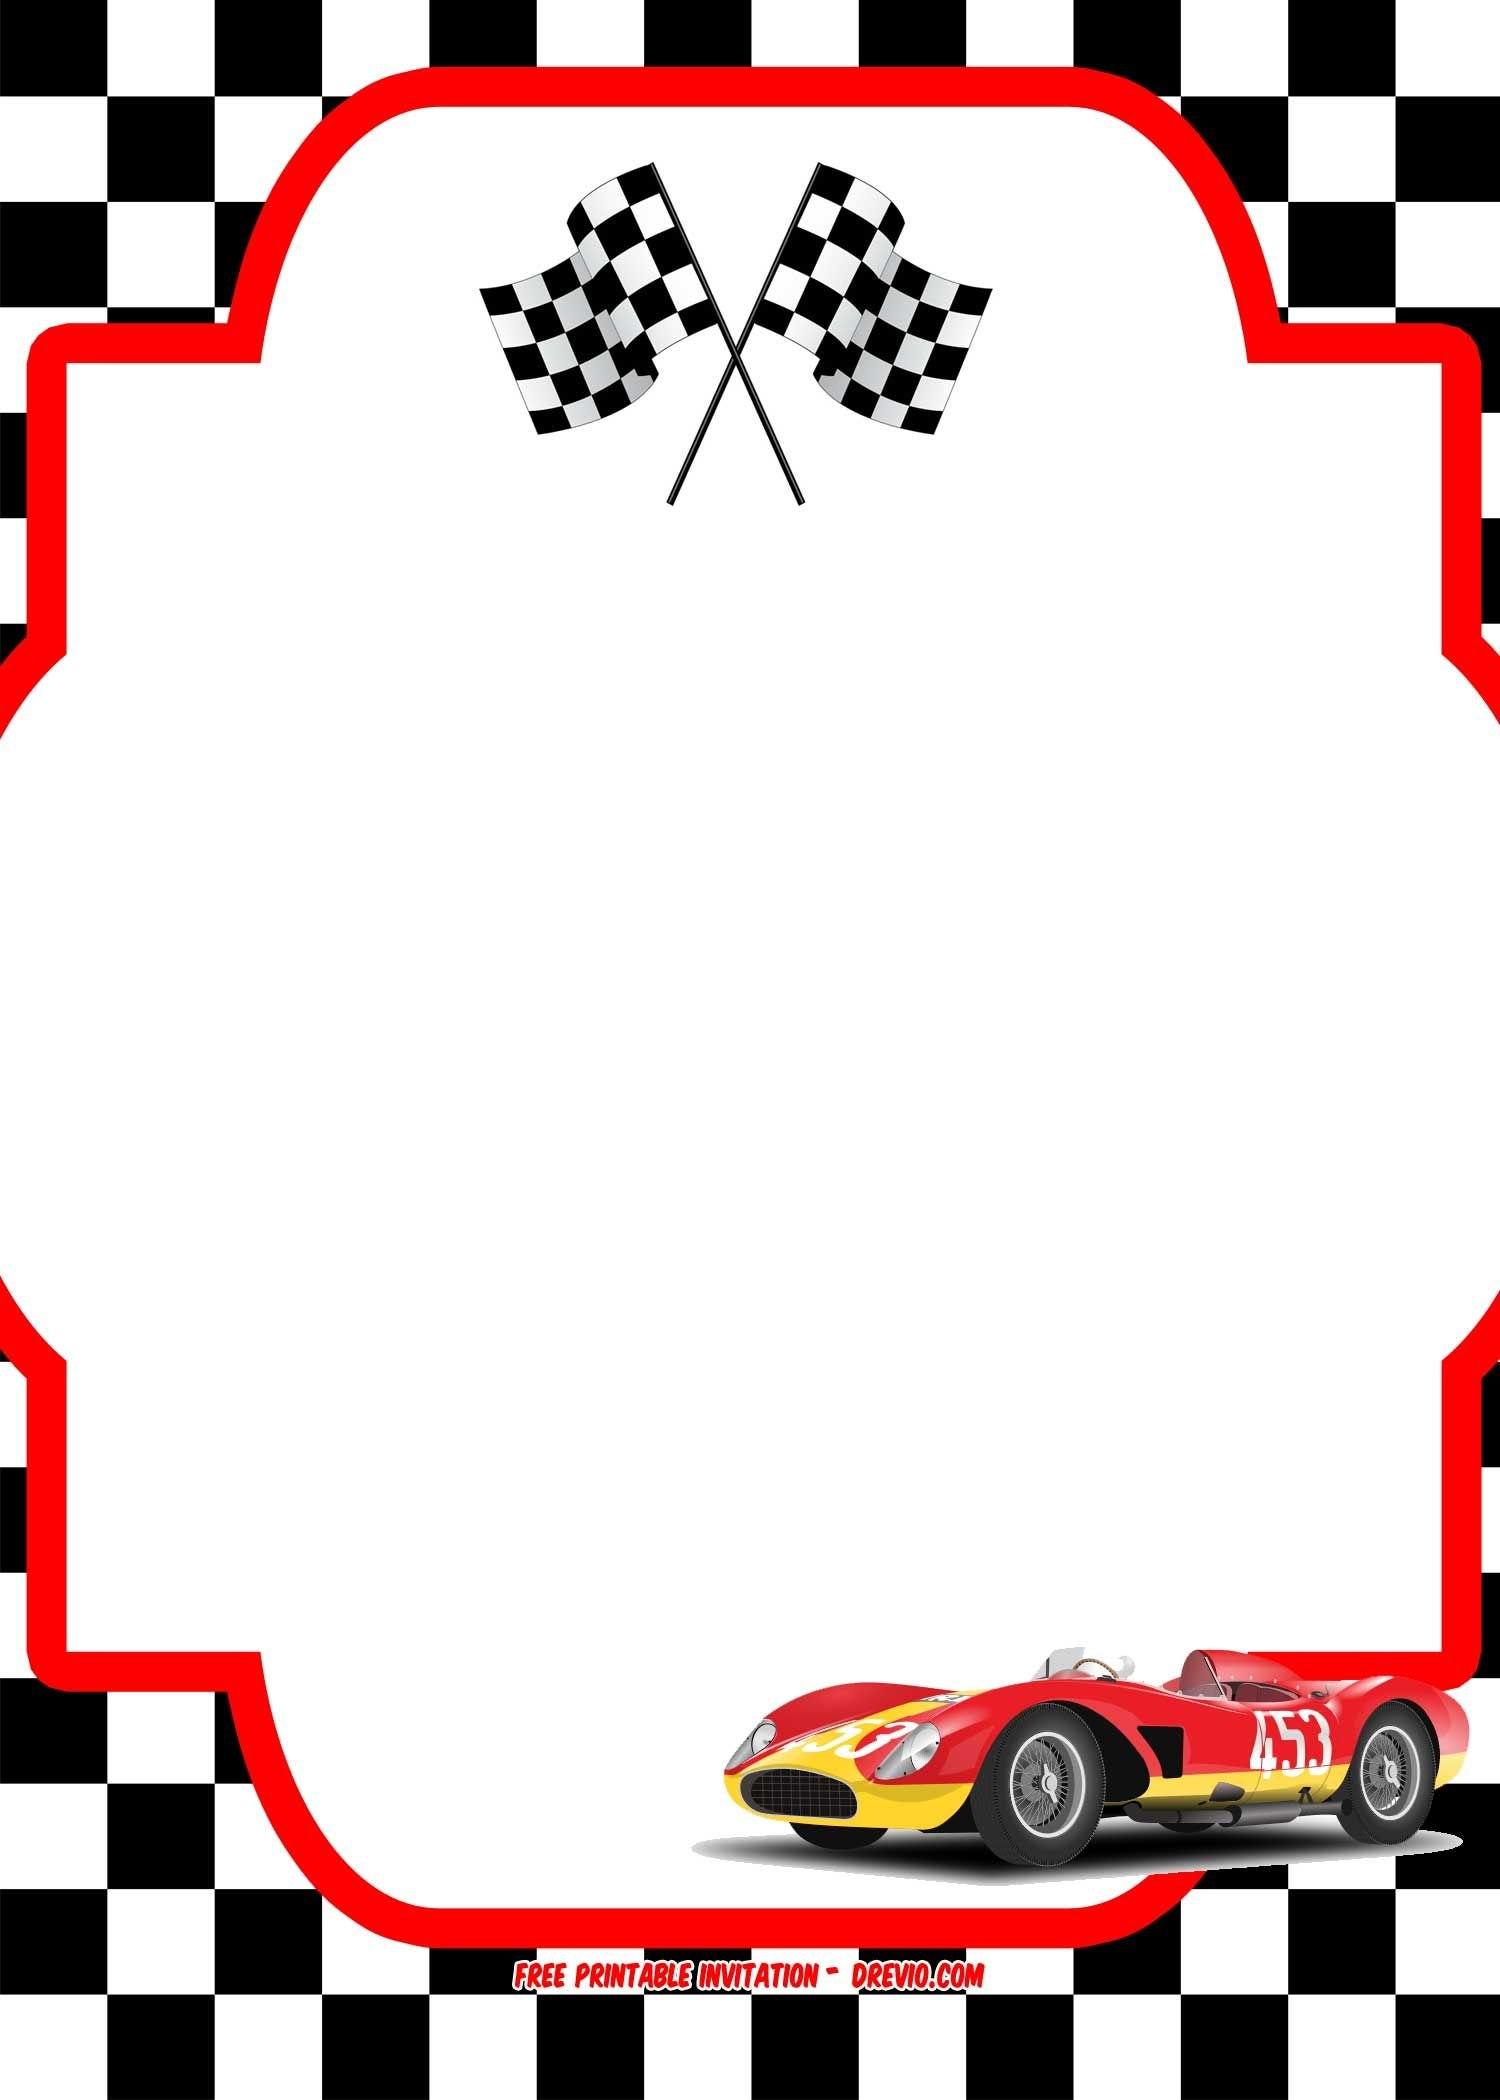 Free Race Car Birthday Invitation Template   Free Printable Inside Blank Race Car Templates